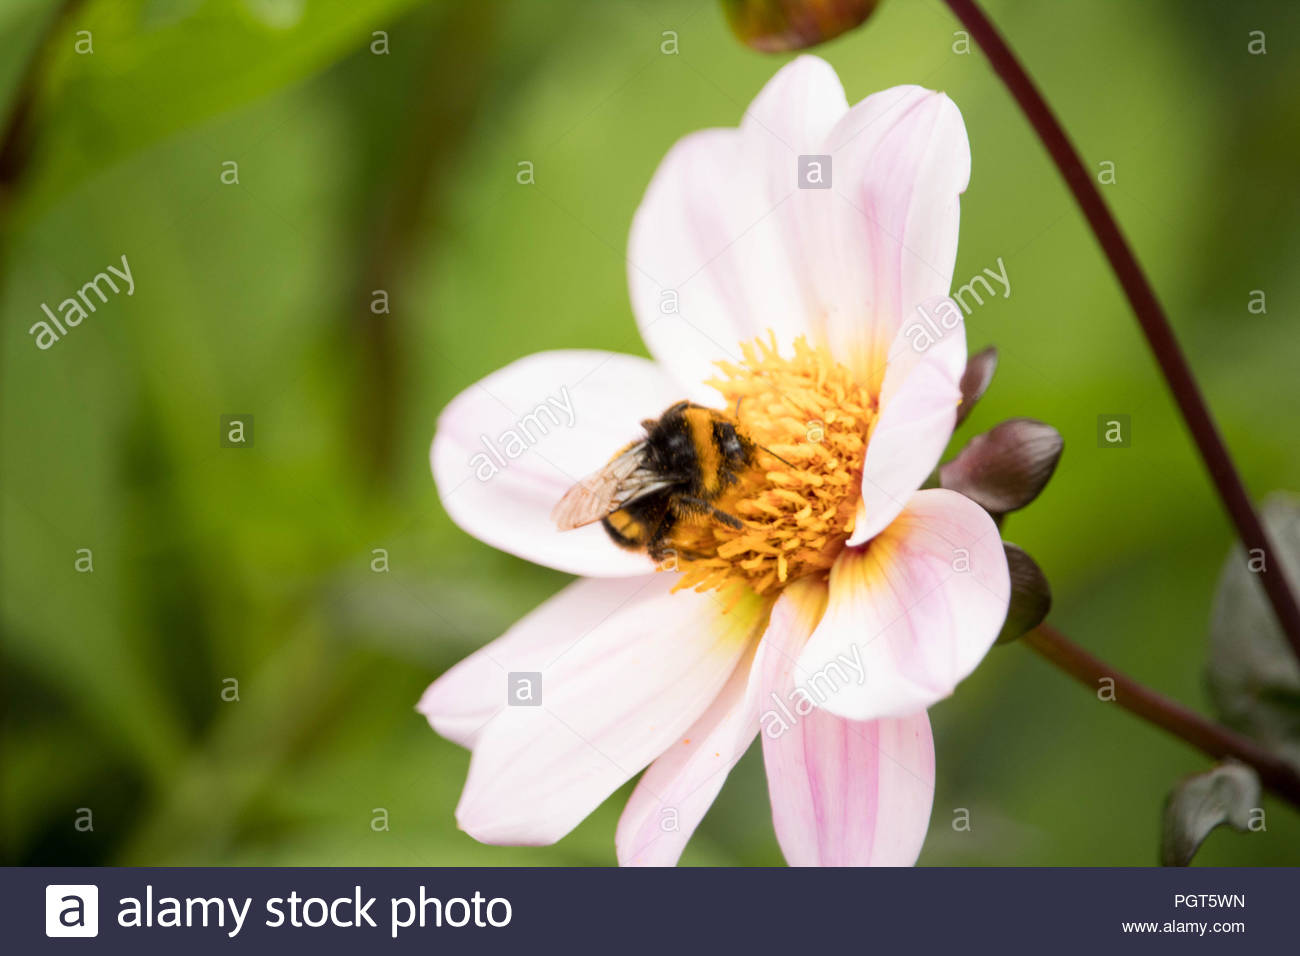 British Summer Garden after rain - a bee settles on a pink-white Dahlia gathering nectar. Stock Photo